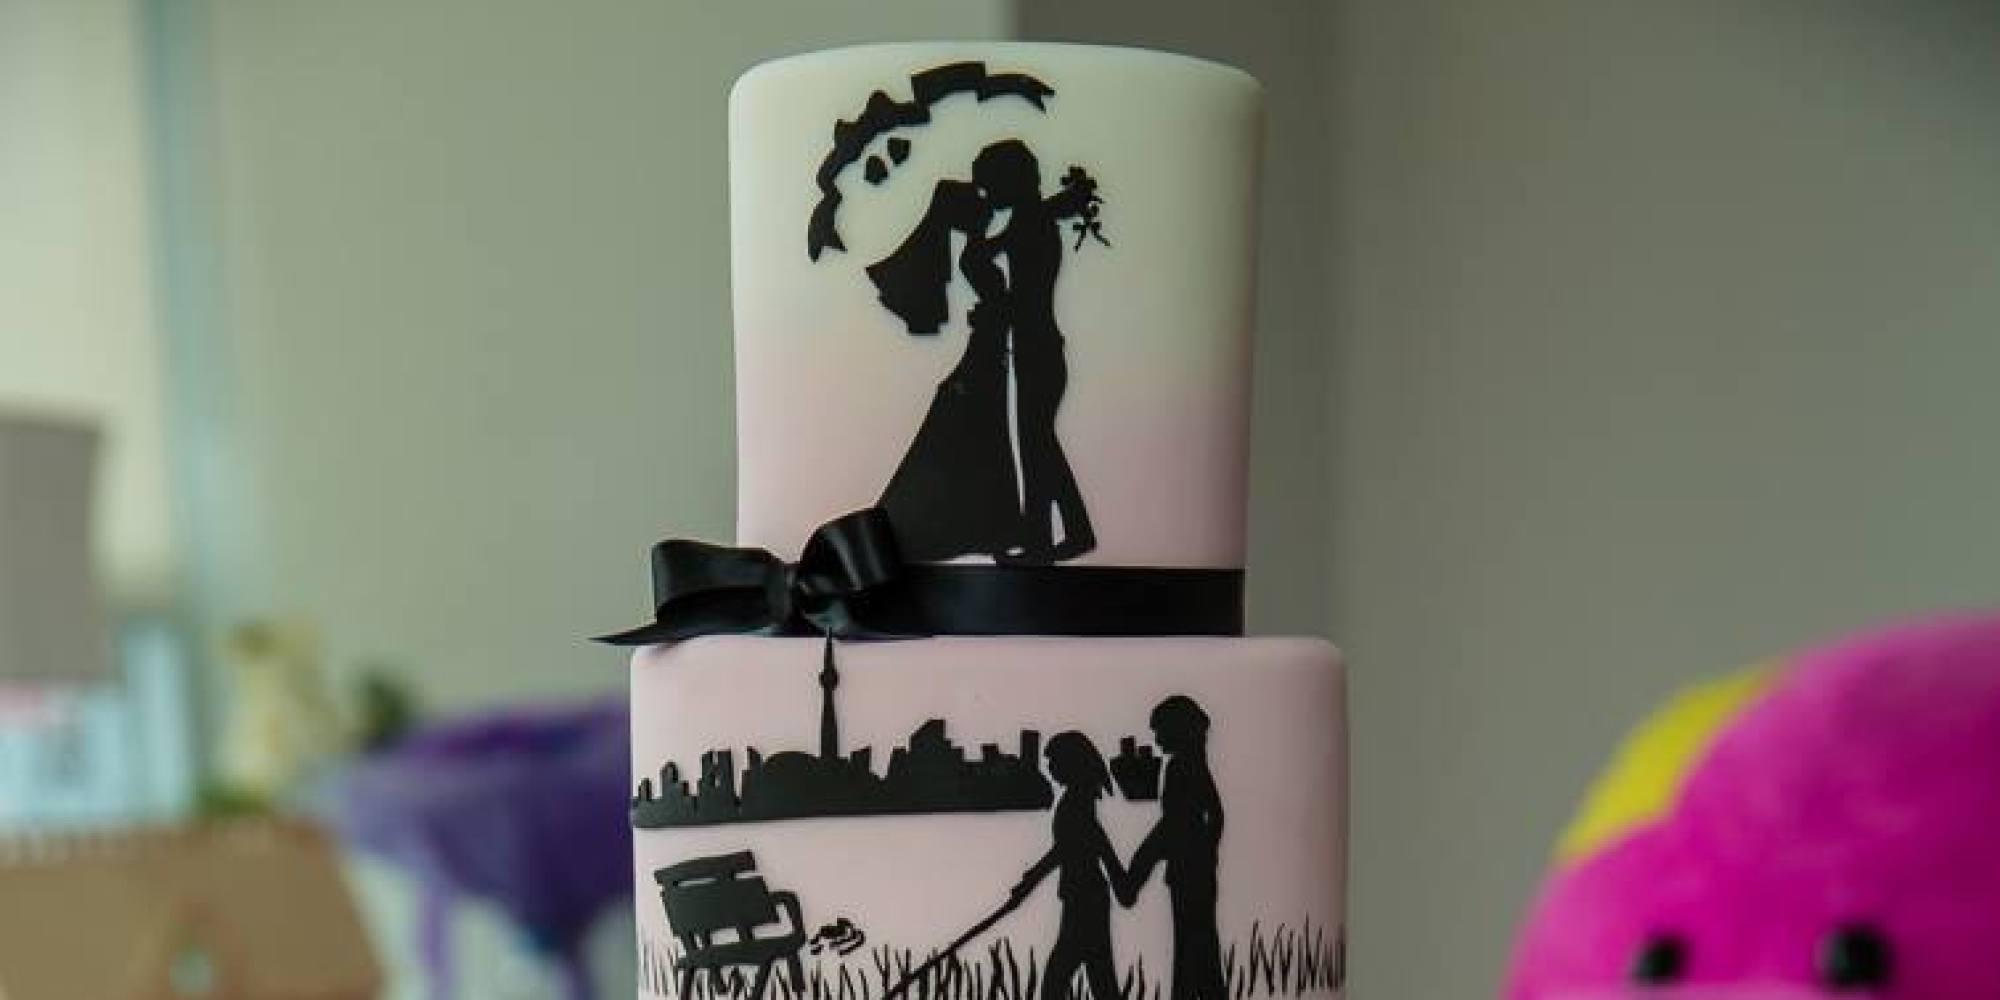 The Most Baffling Wedding Cake Ever Just Got A Beautiful